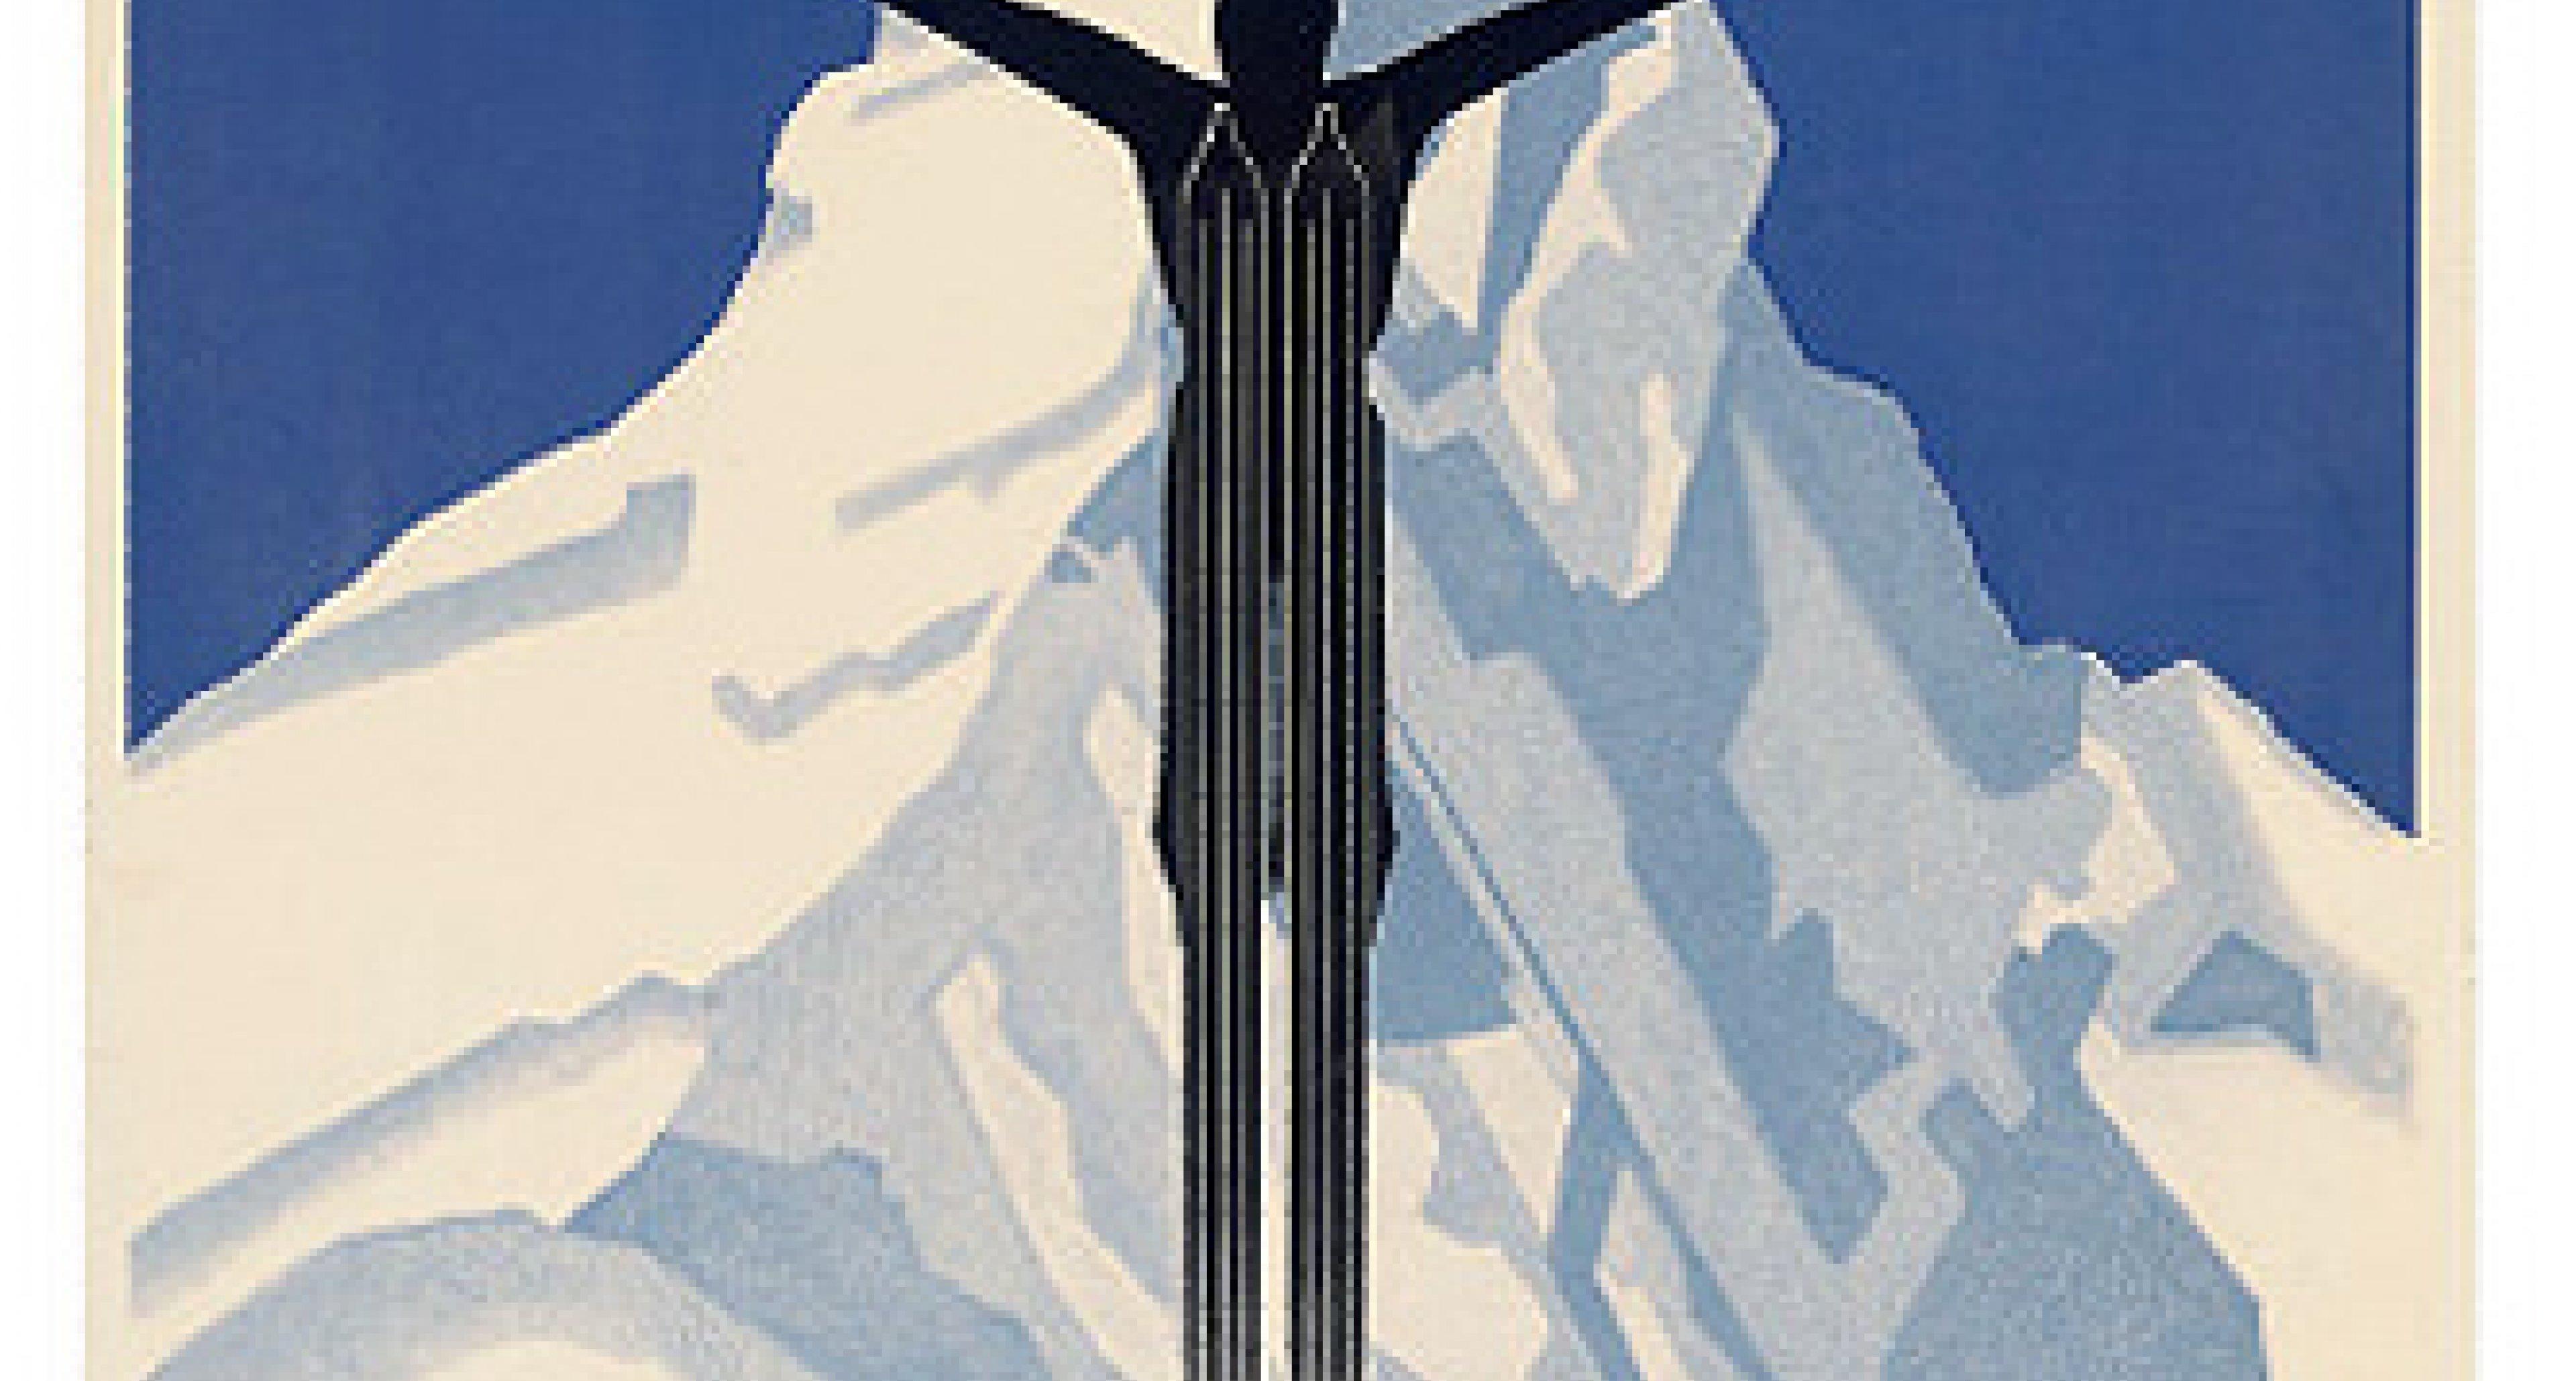 The Ski Sale: Christie's versteigert Wintersportplakate